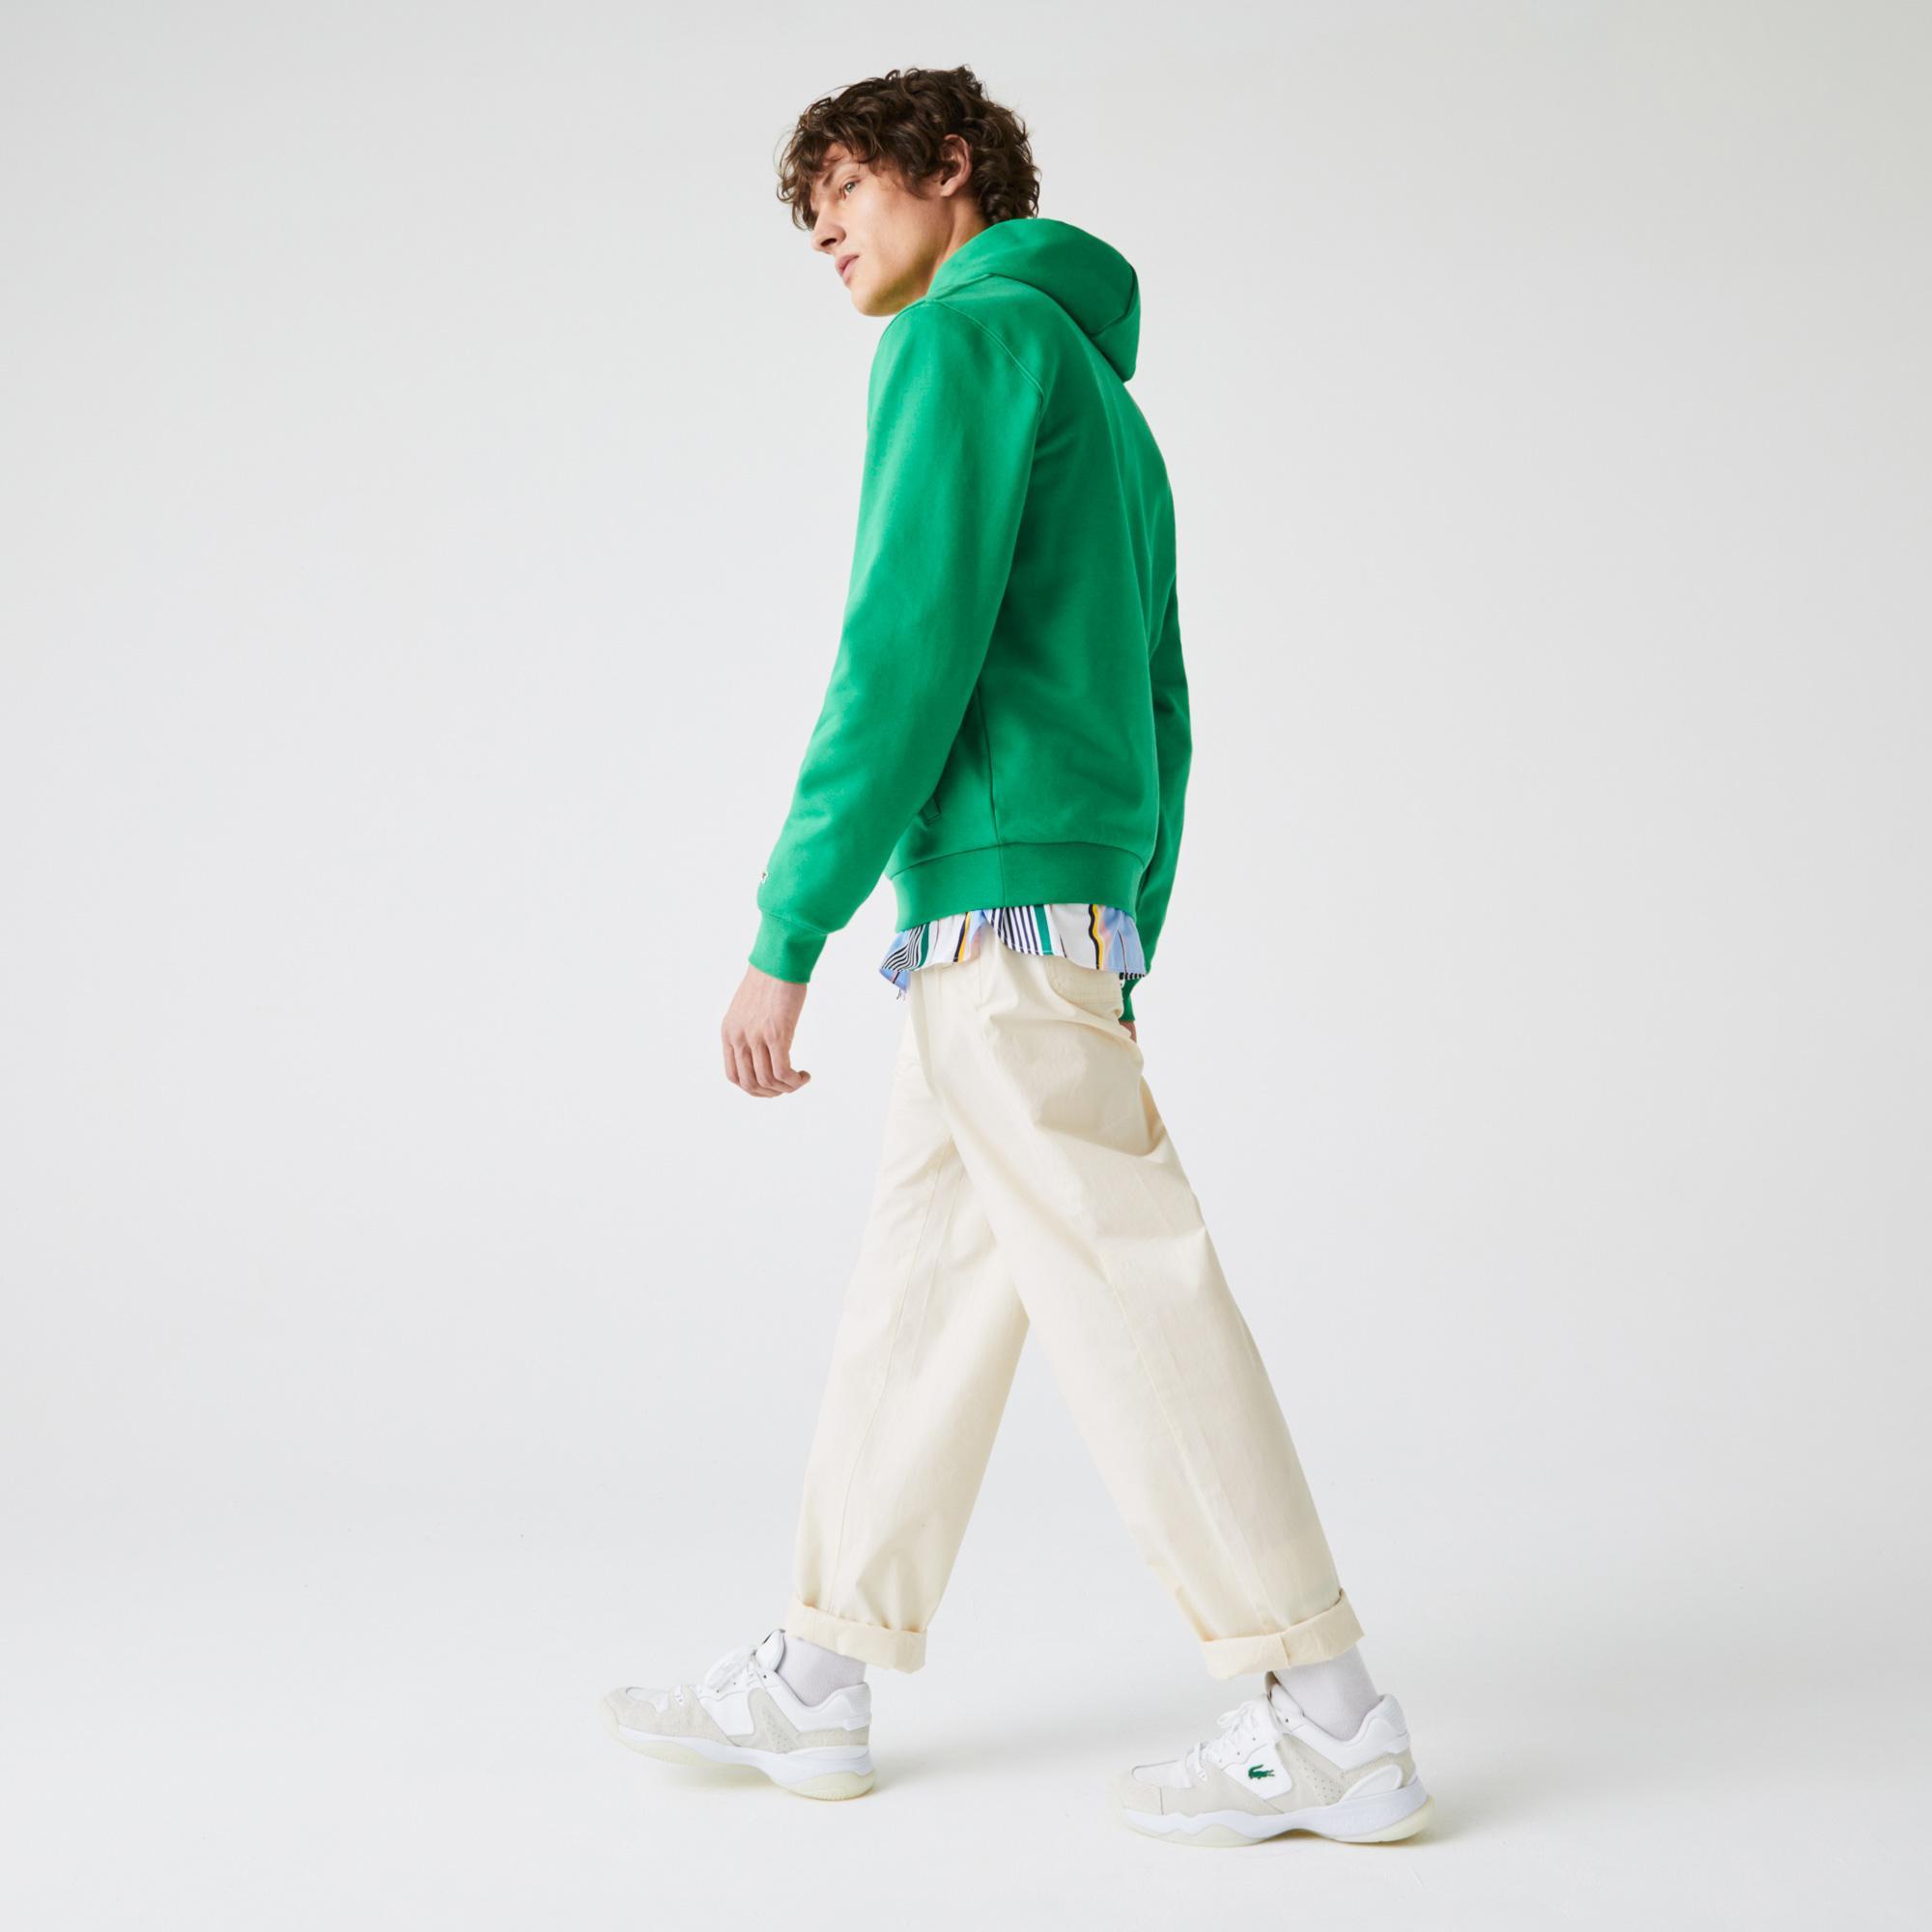 Lacoste Men's Lightweight Stretch Poplin Chino Pants